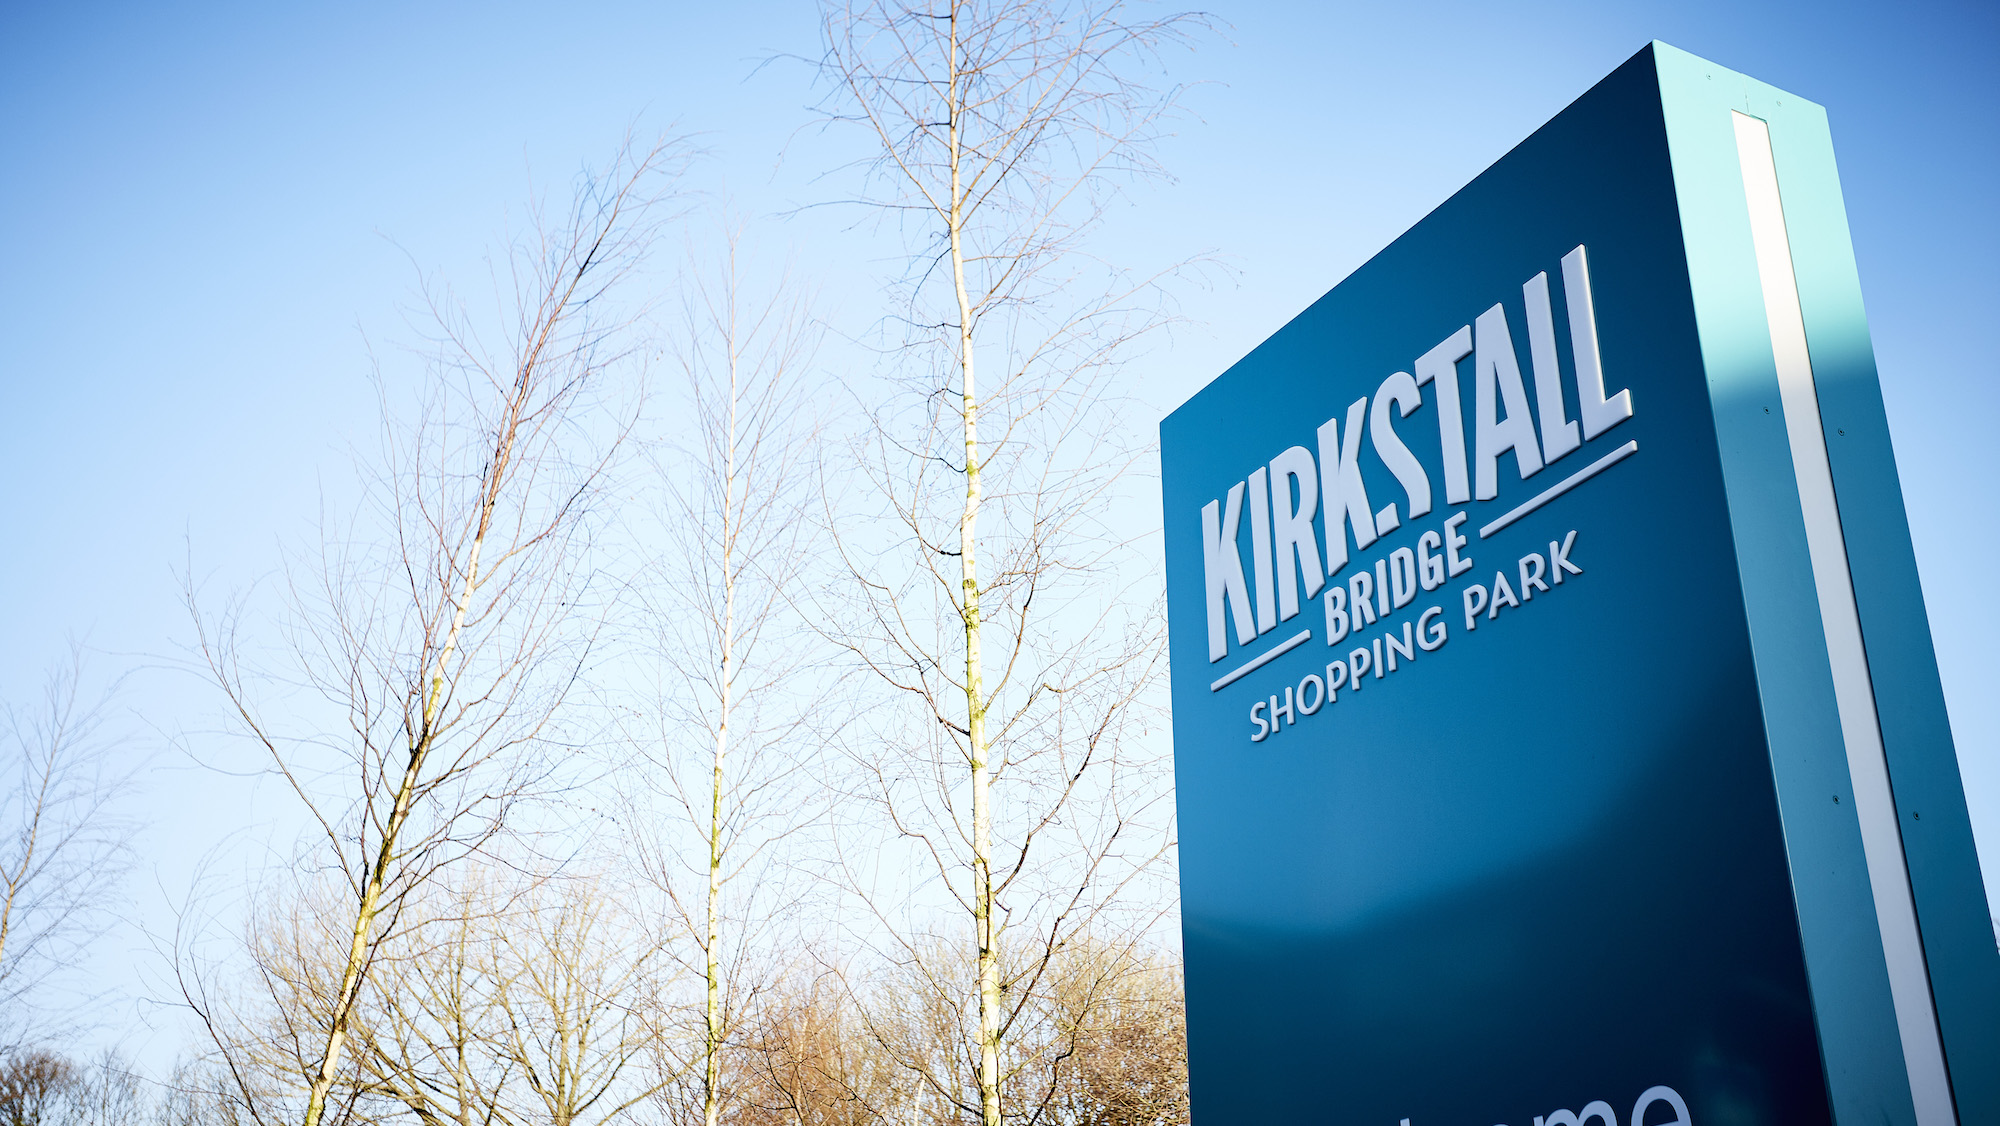 Kirkstall Bridge Shopping Park